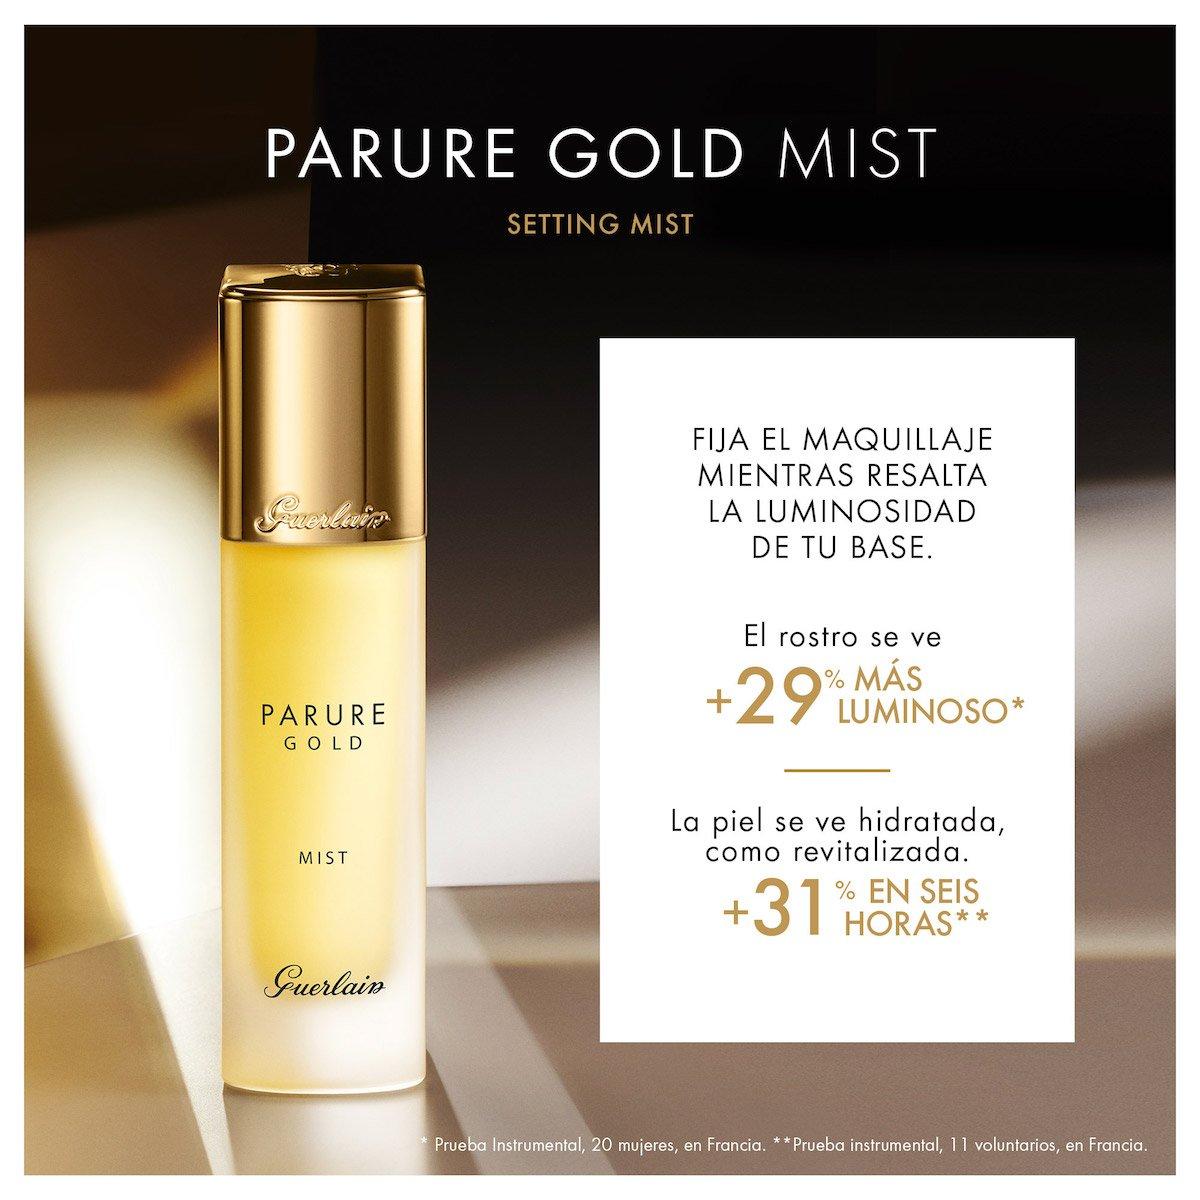 Bruma Fijadora de Maquillaje Guerlain Parure Gold Mist 30 Ml